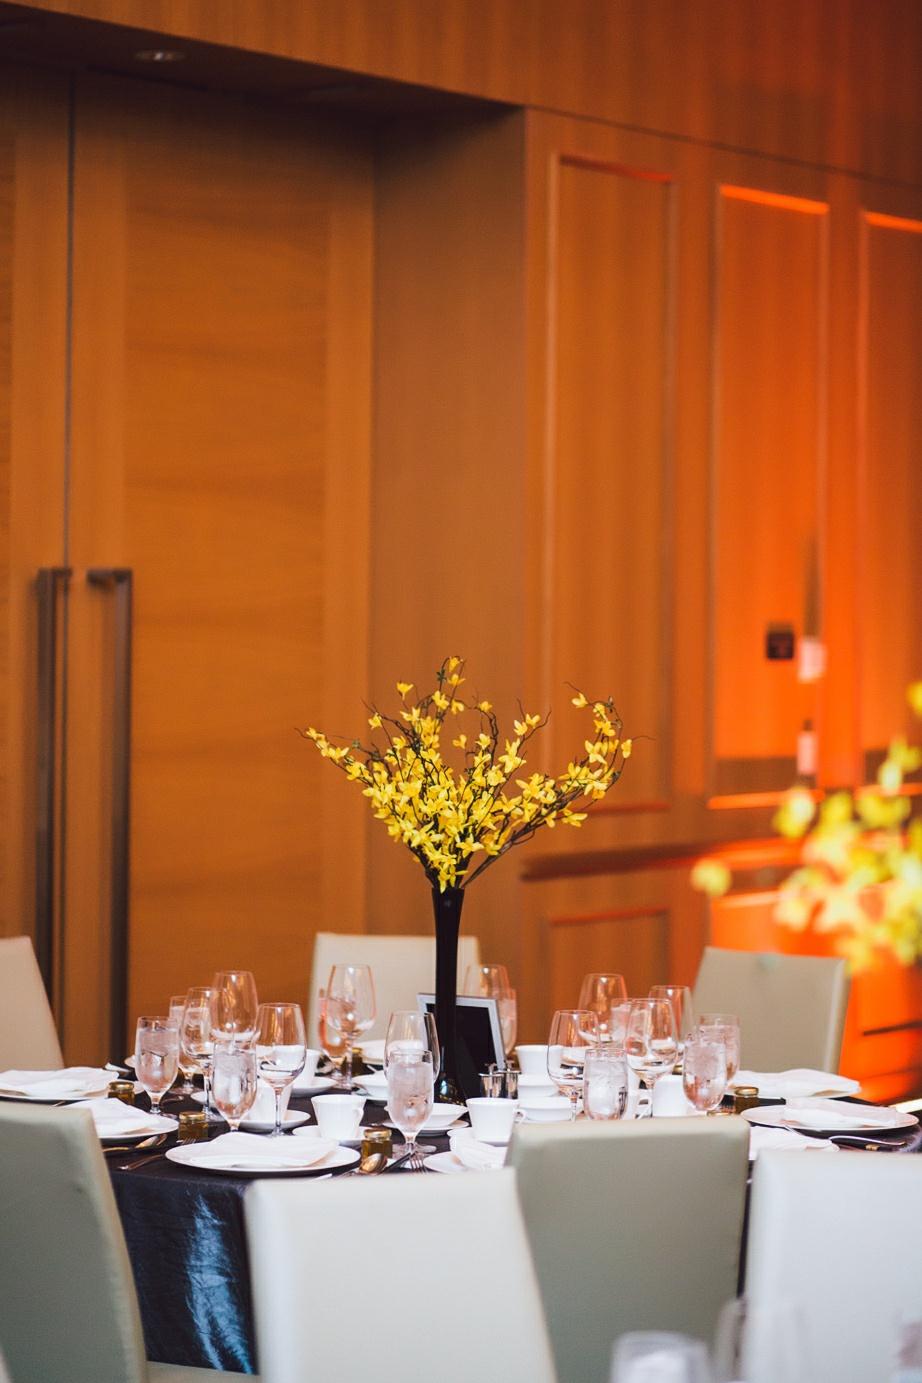 shangri la banquet hall toronto